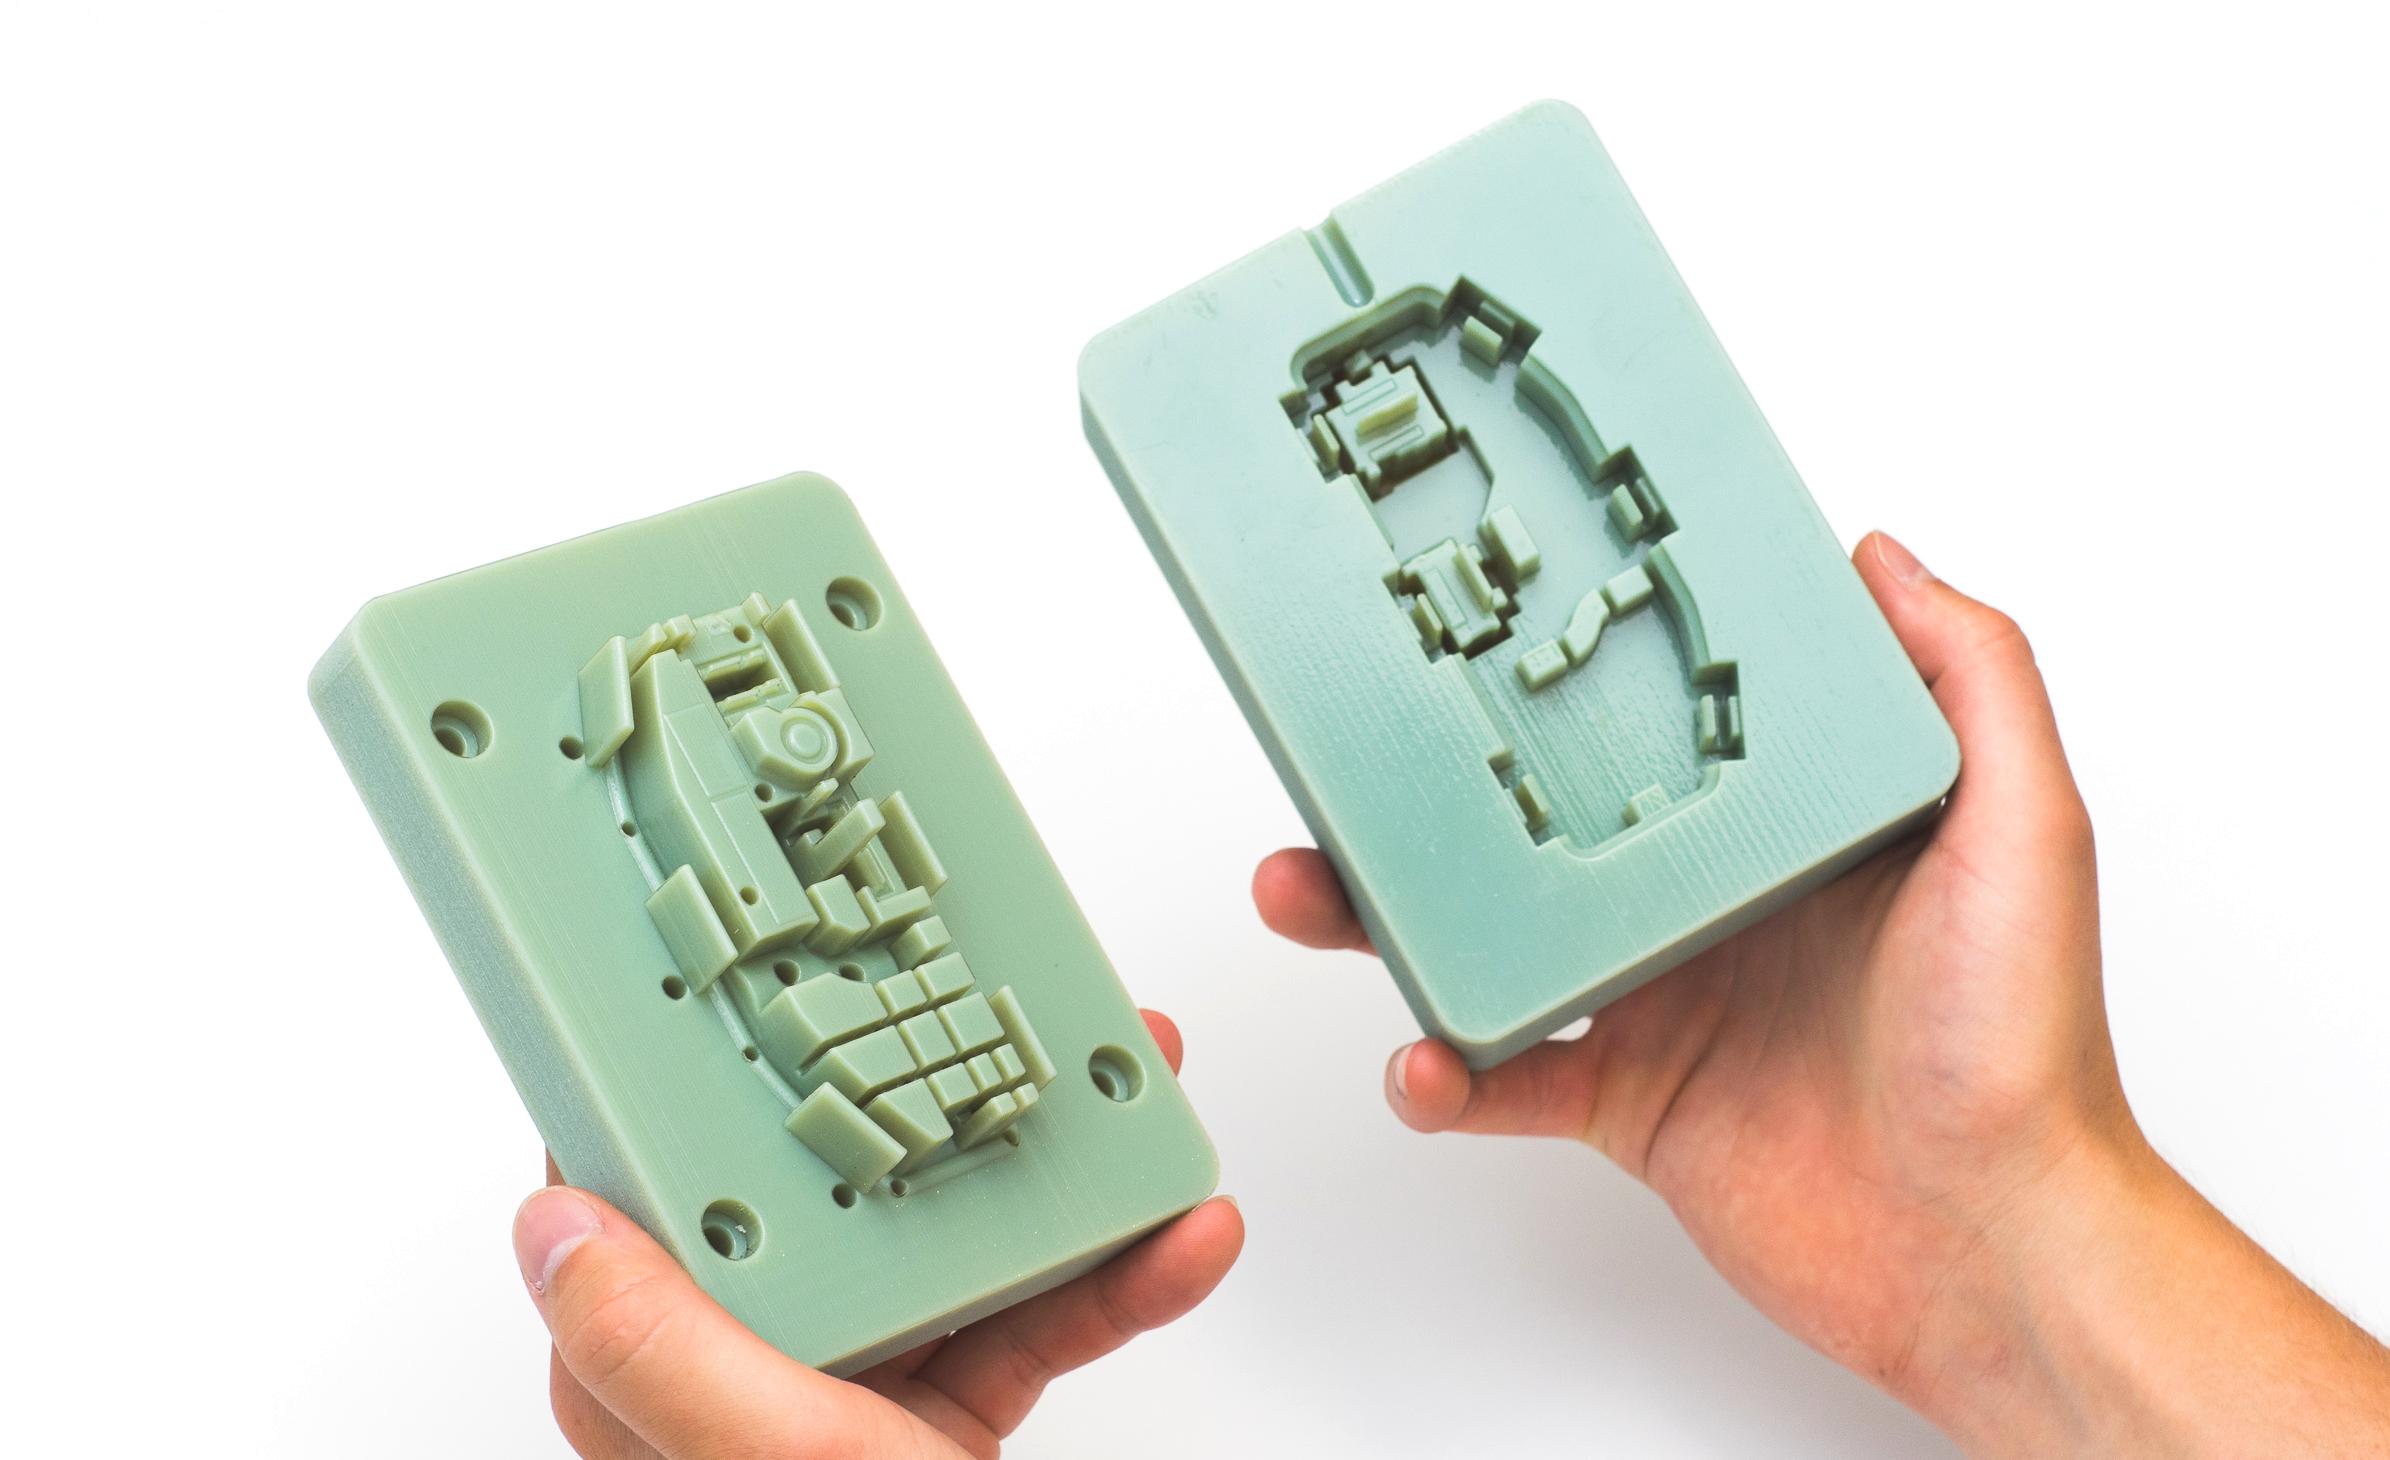 یک قالب تزریق پلاستیک پرینت سه بعدی با متریال Digital ABS